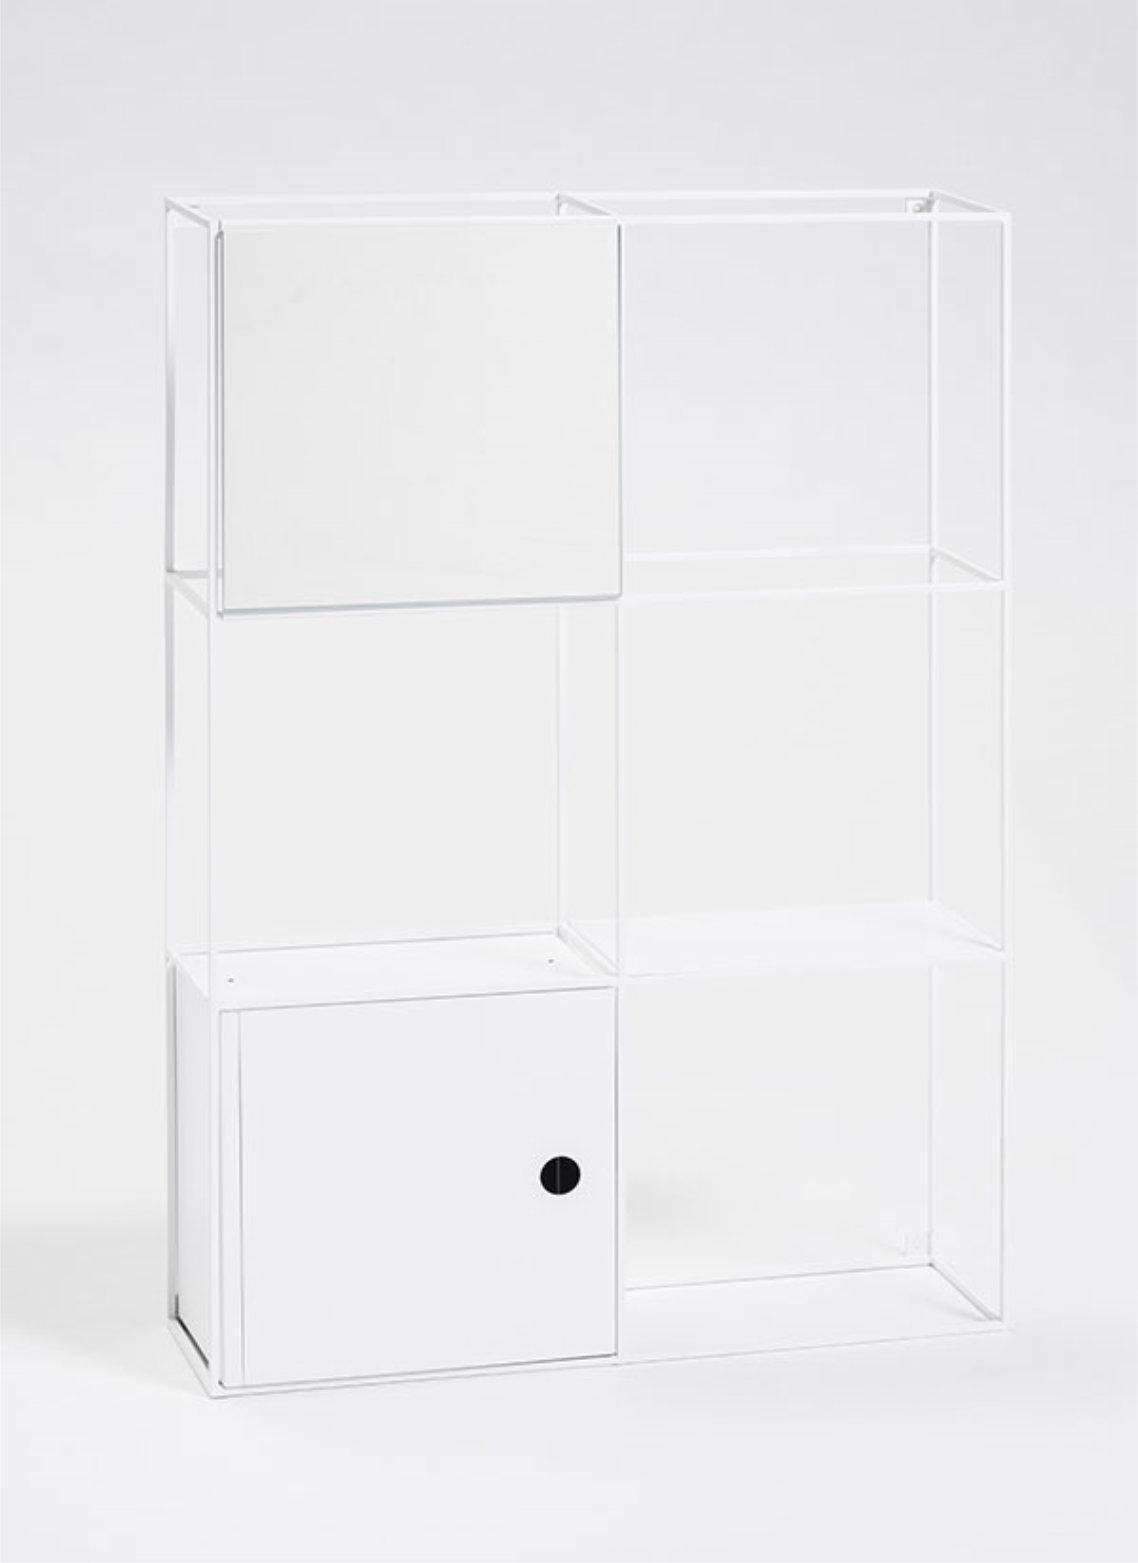 interiorlines_felt_white_norm_architects_5_1.jpg